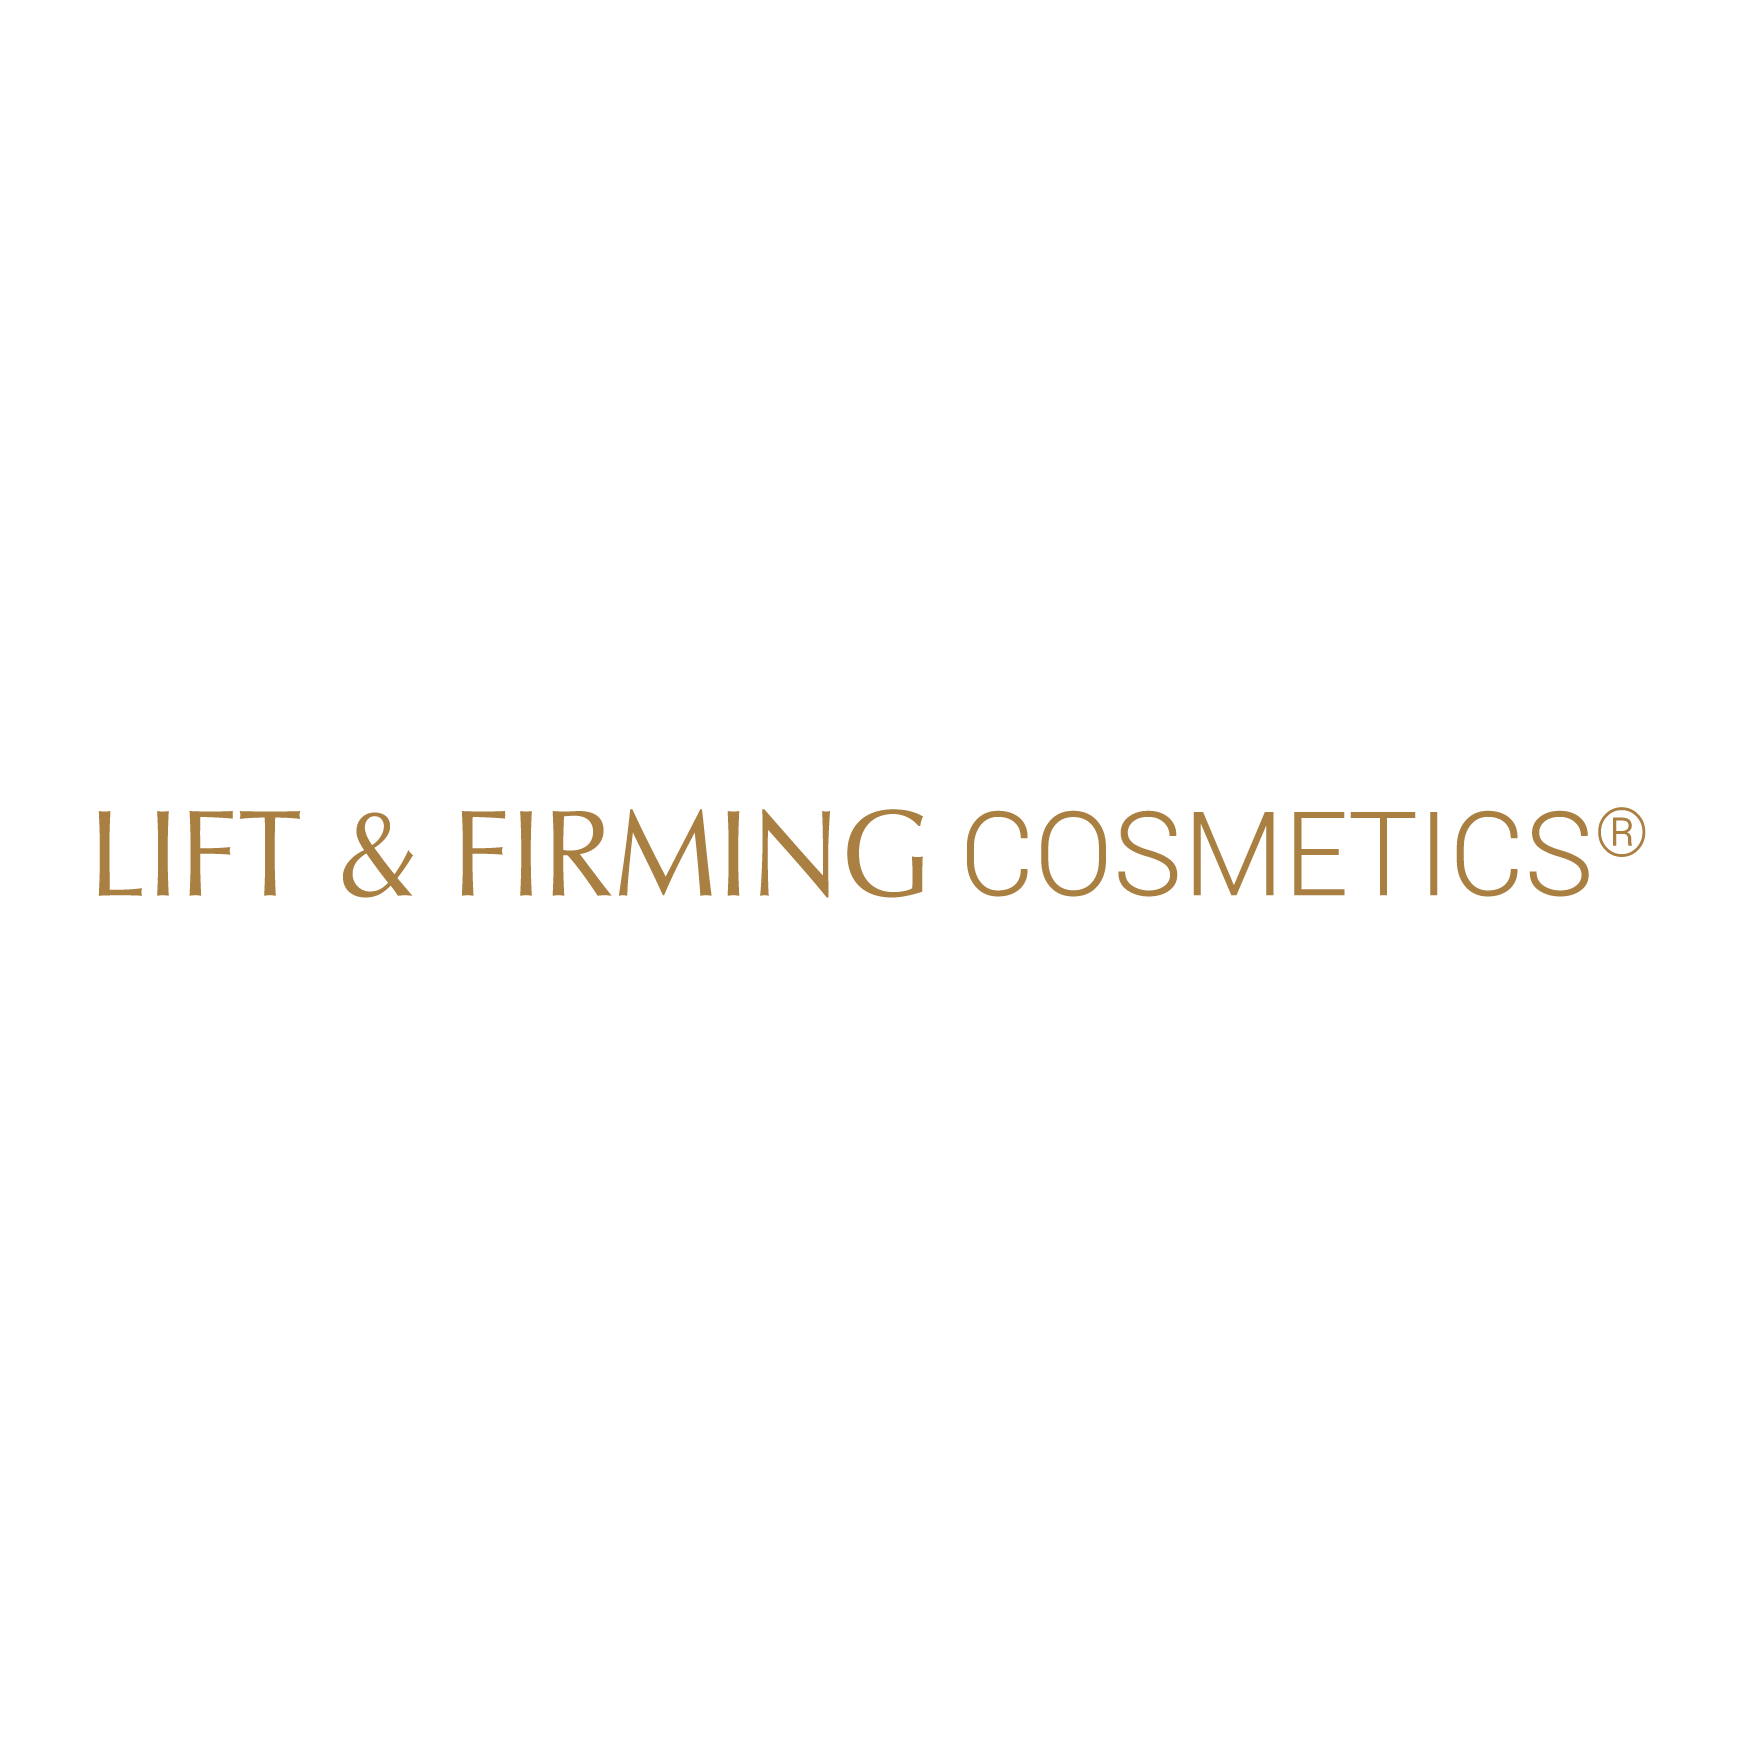 Lift Firming Cosmetics